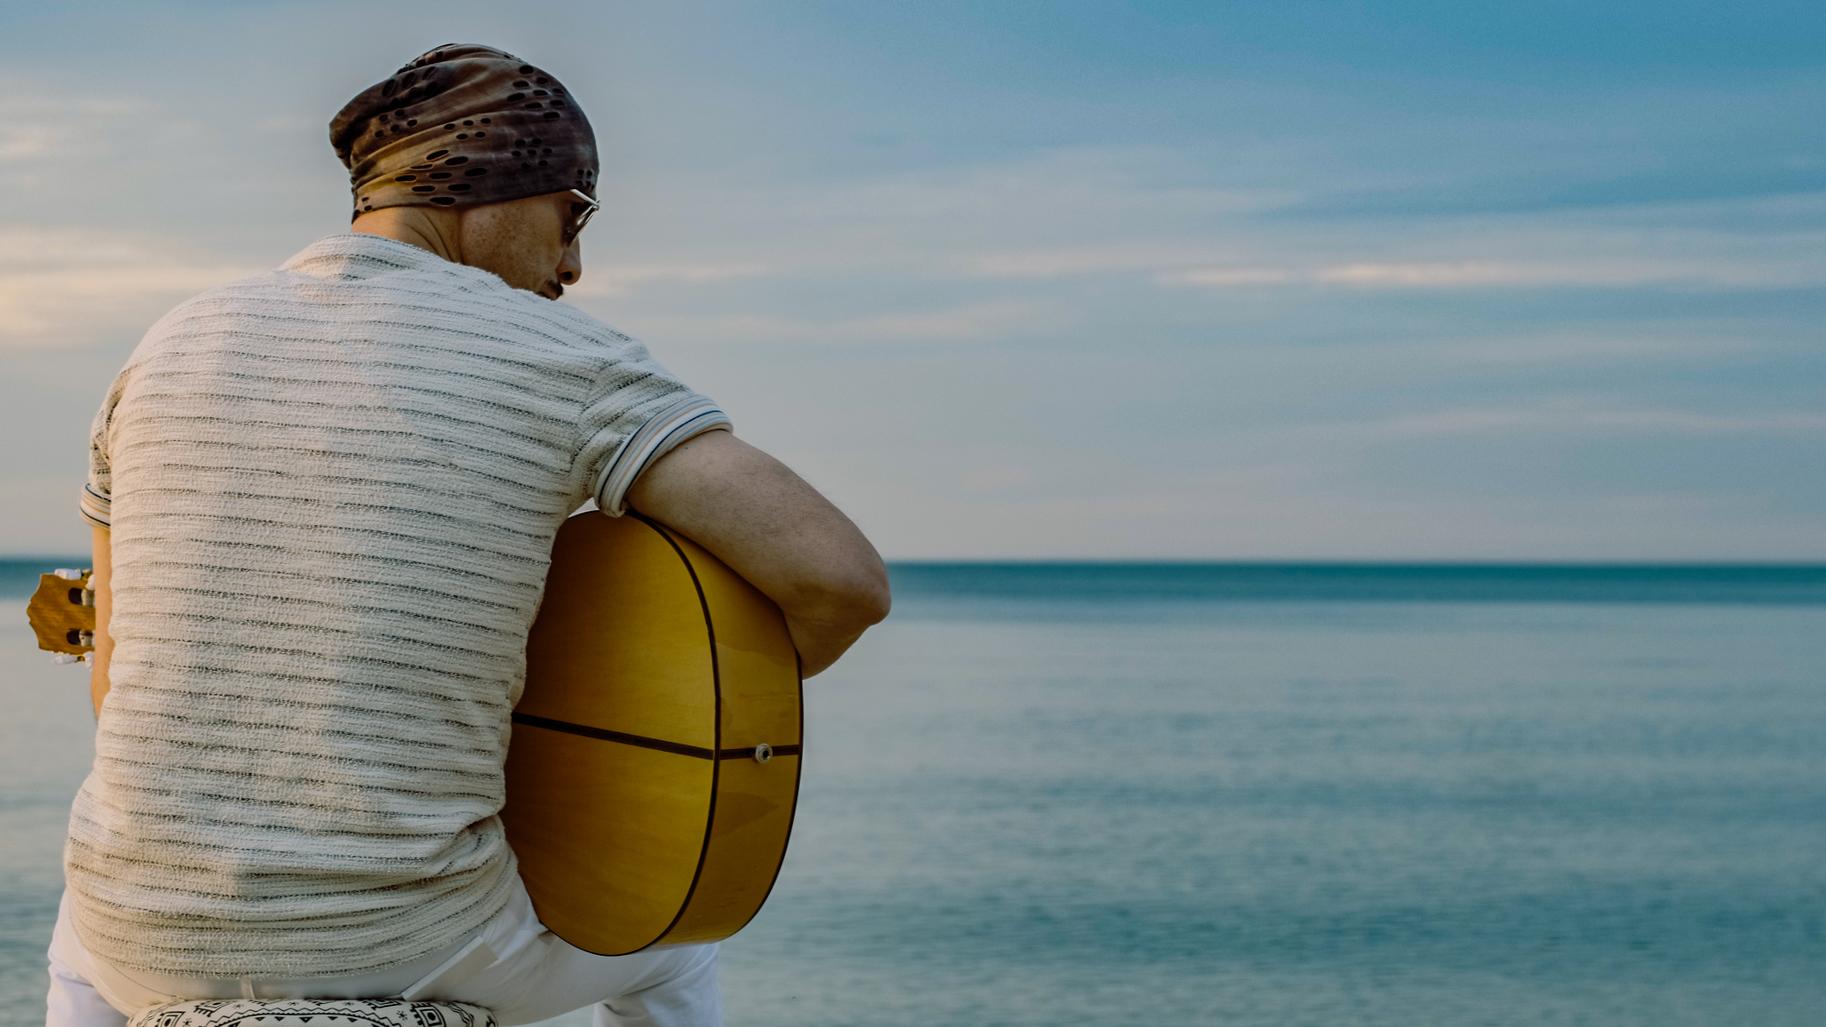 Guitar and Sea Back Facing Camera